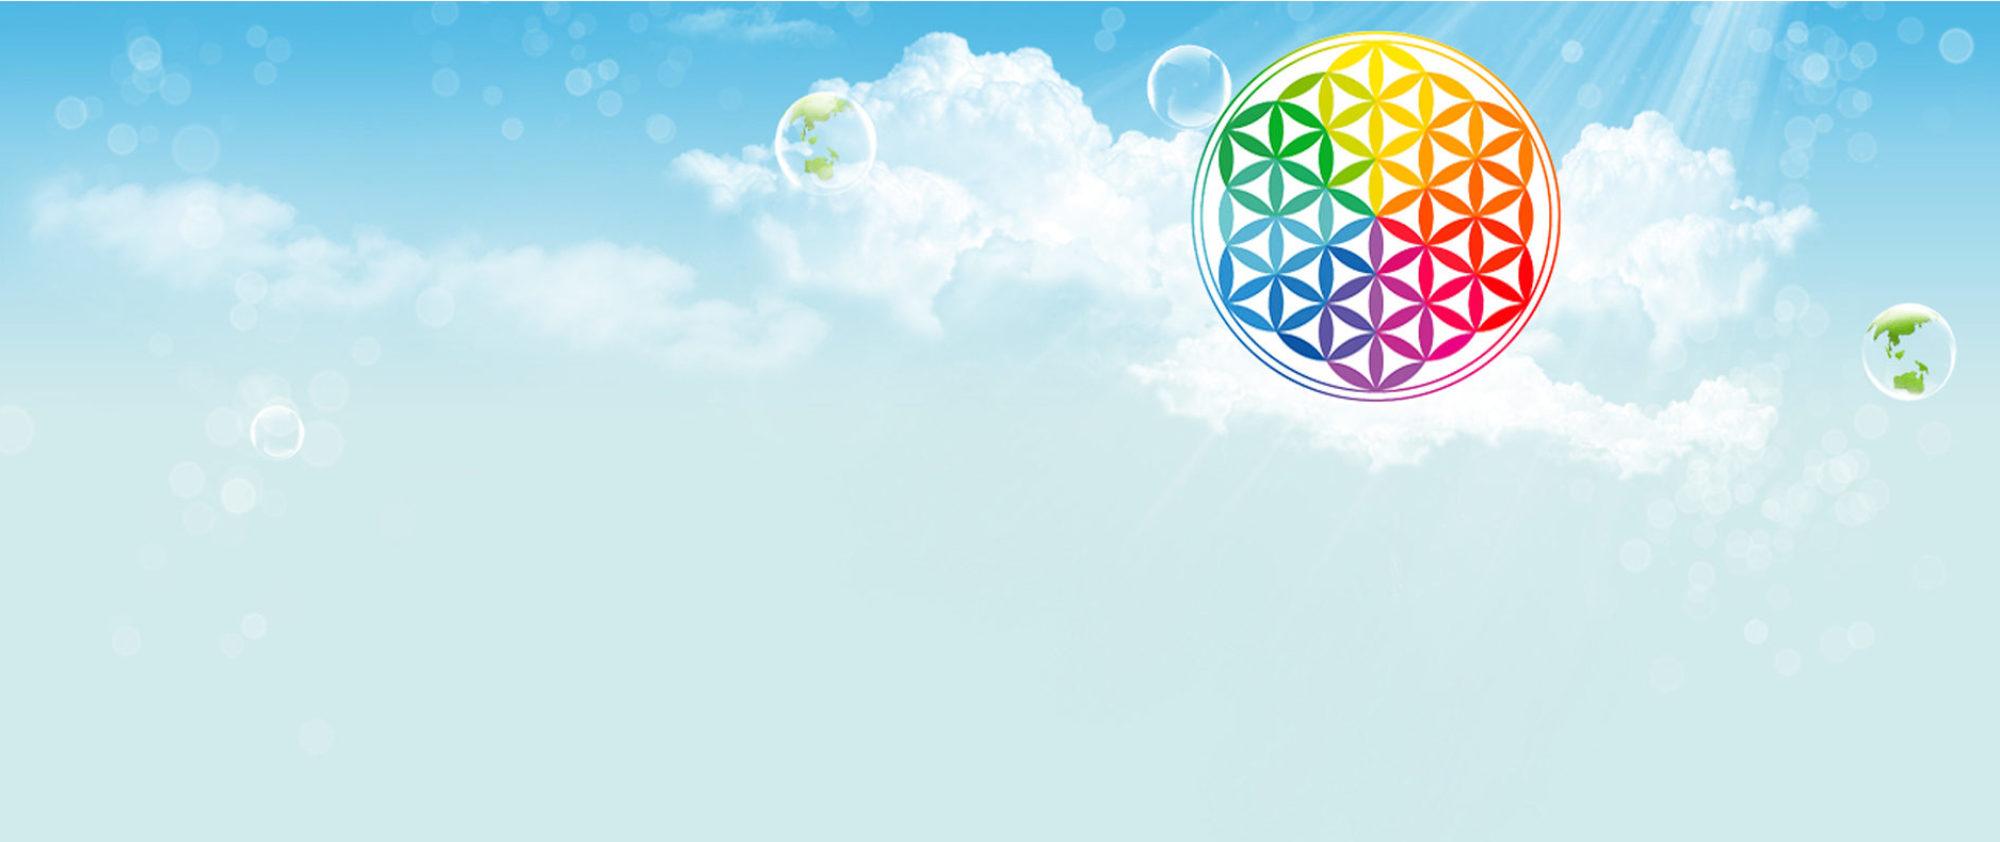 "Центр самопознания и духовного развития Романа Лаврик ""Синтез знаний"""